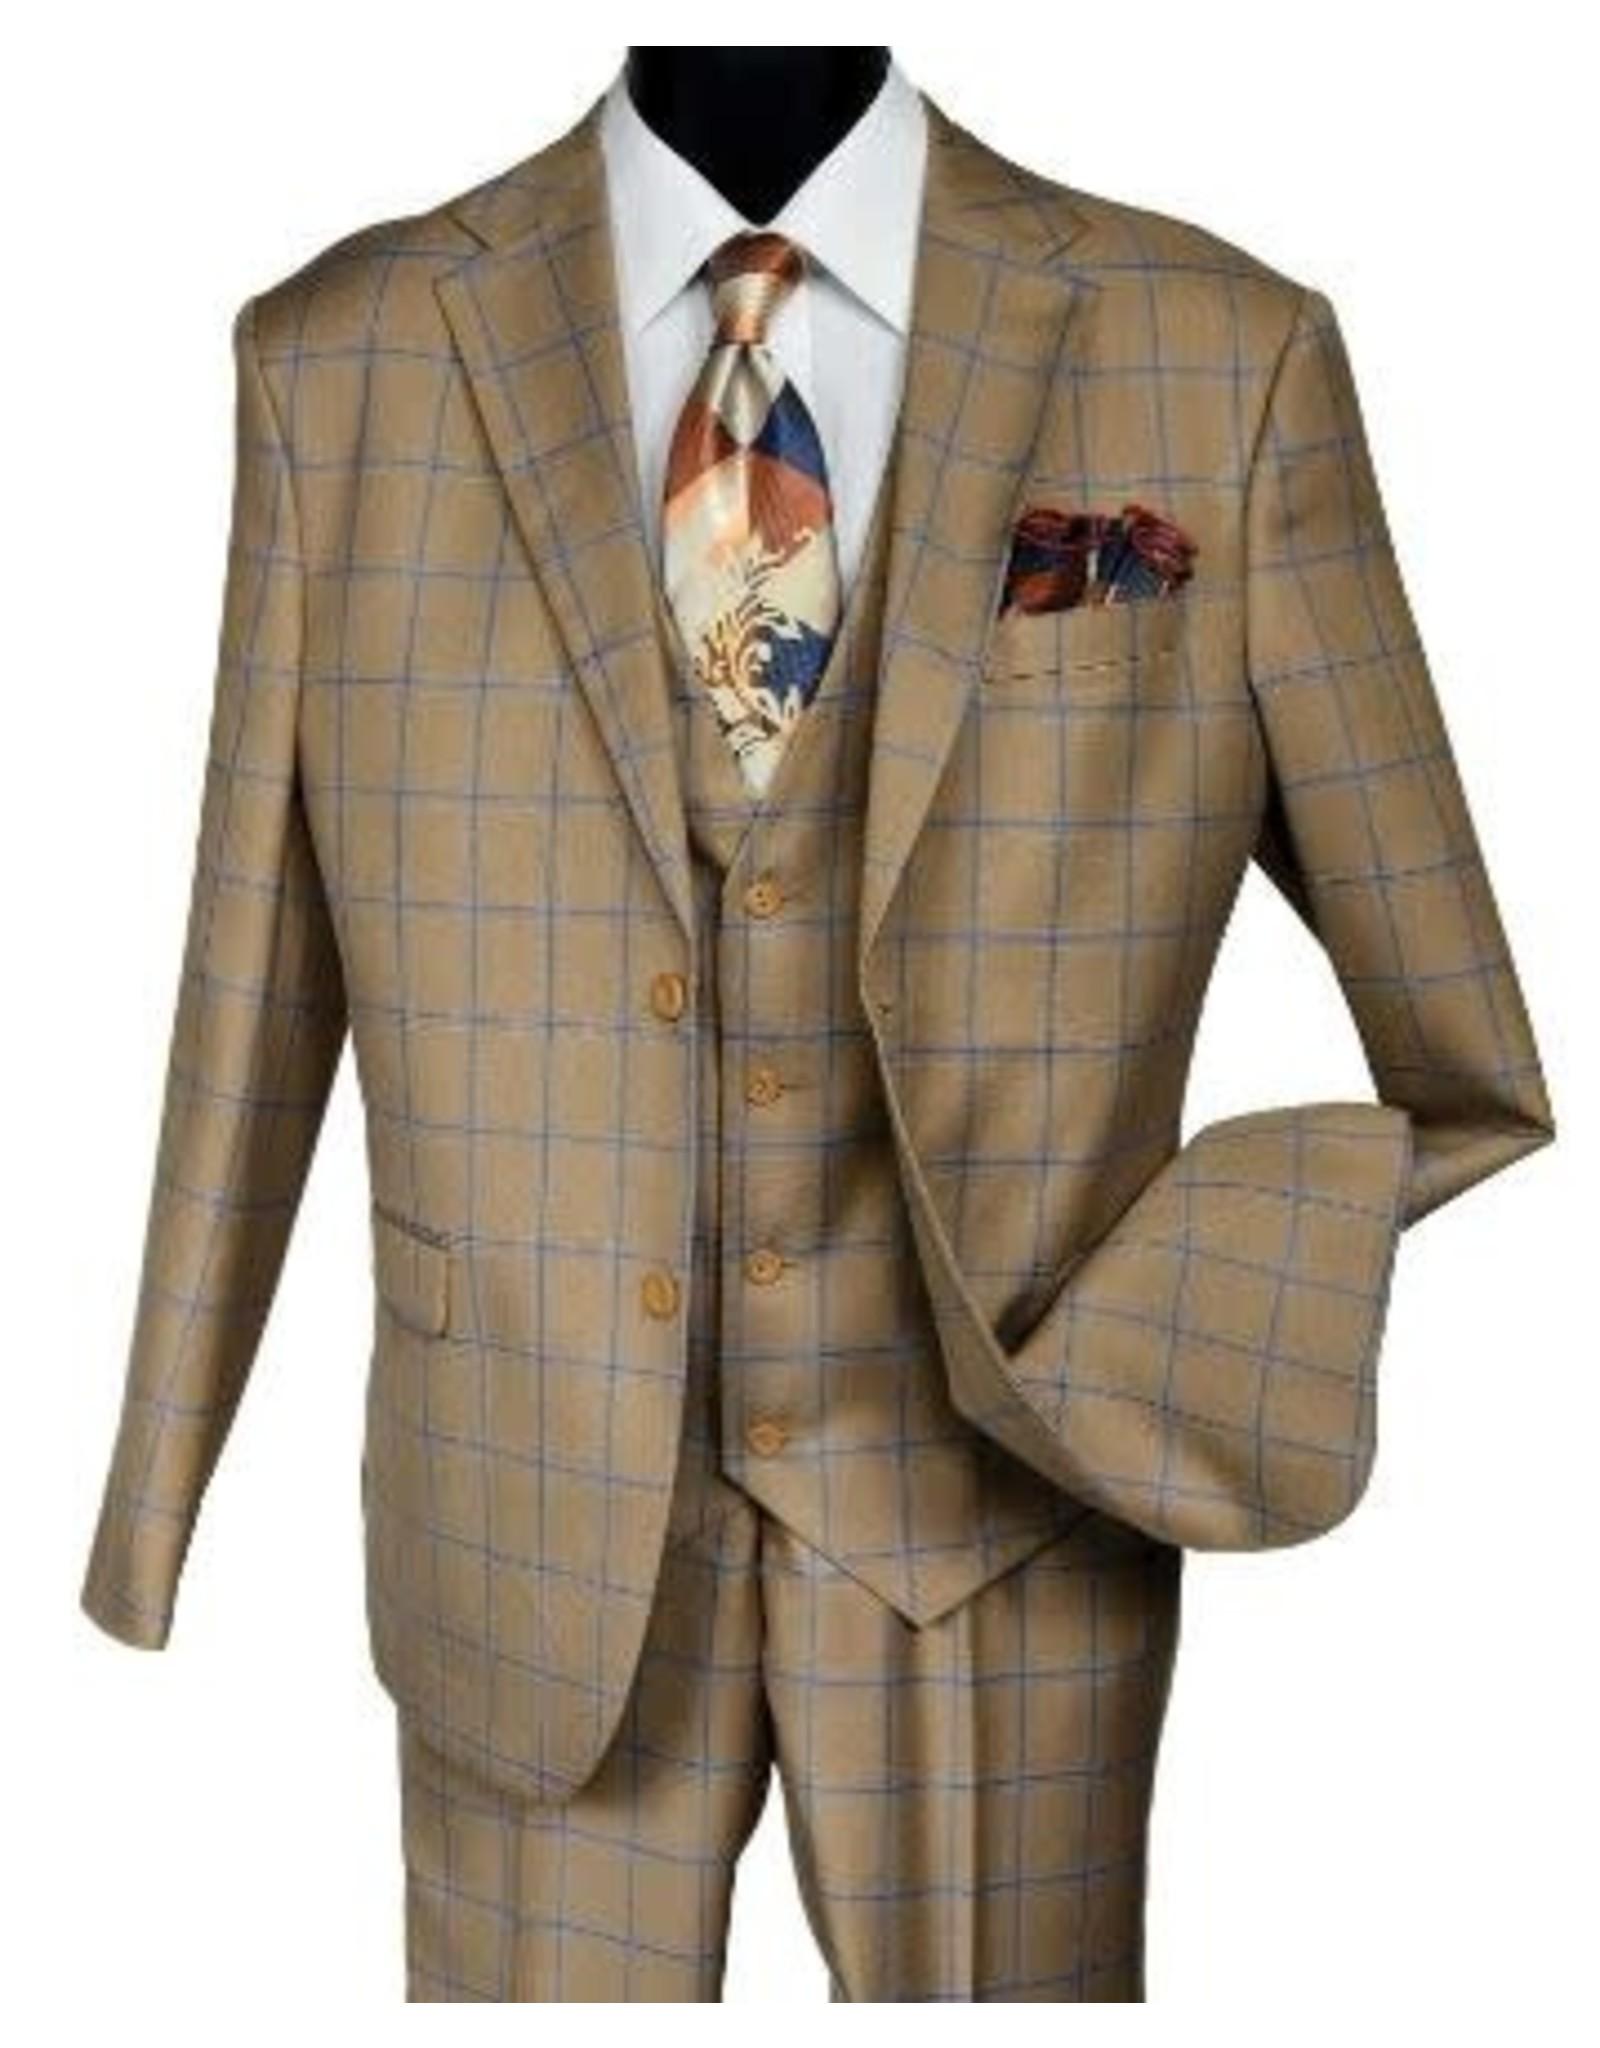 Falcone Falcone Vested Suit - 9228/728 Toast